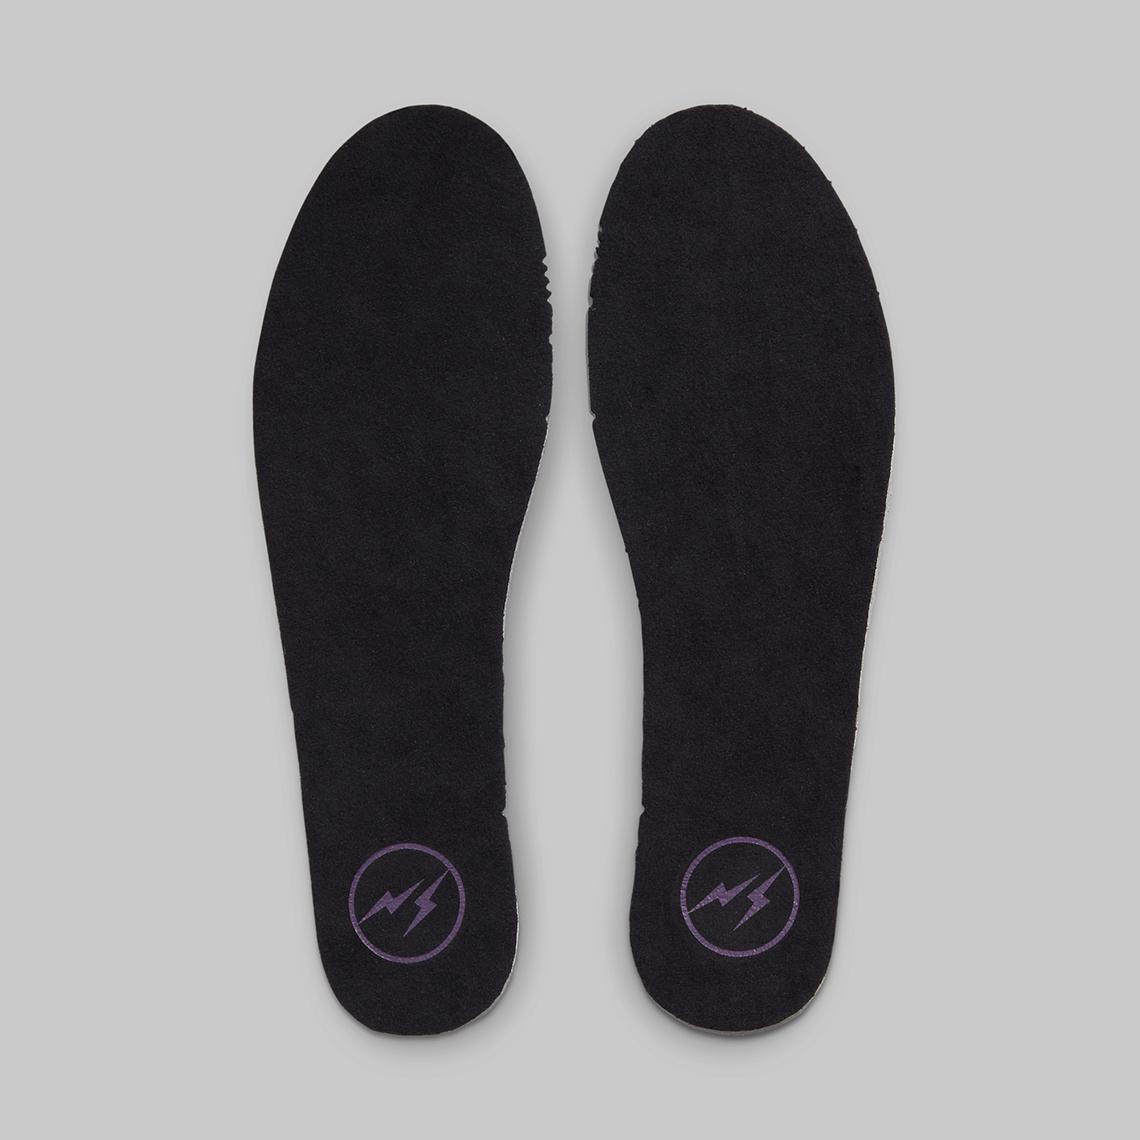 fragment-Nike-Dunk-High-Beijing-2021-DJ0382-600-1.jpg?w=1140